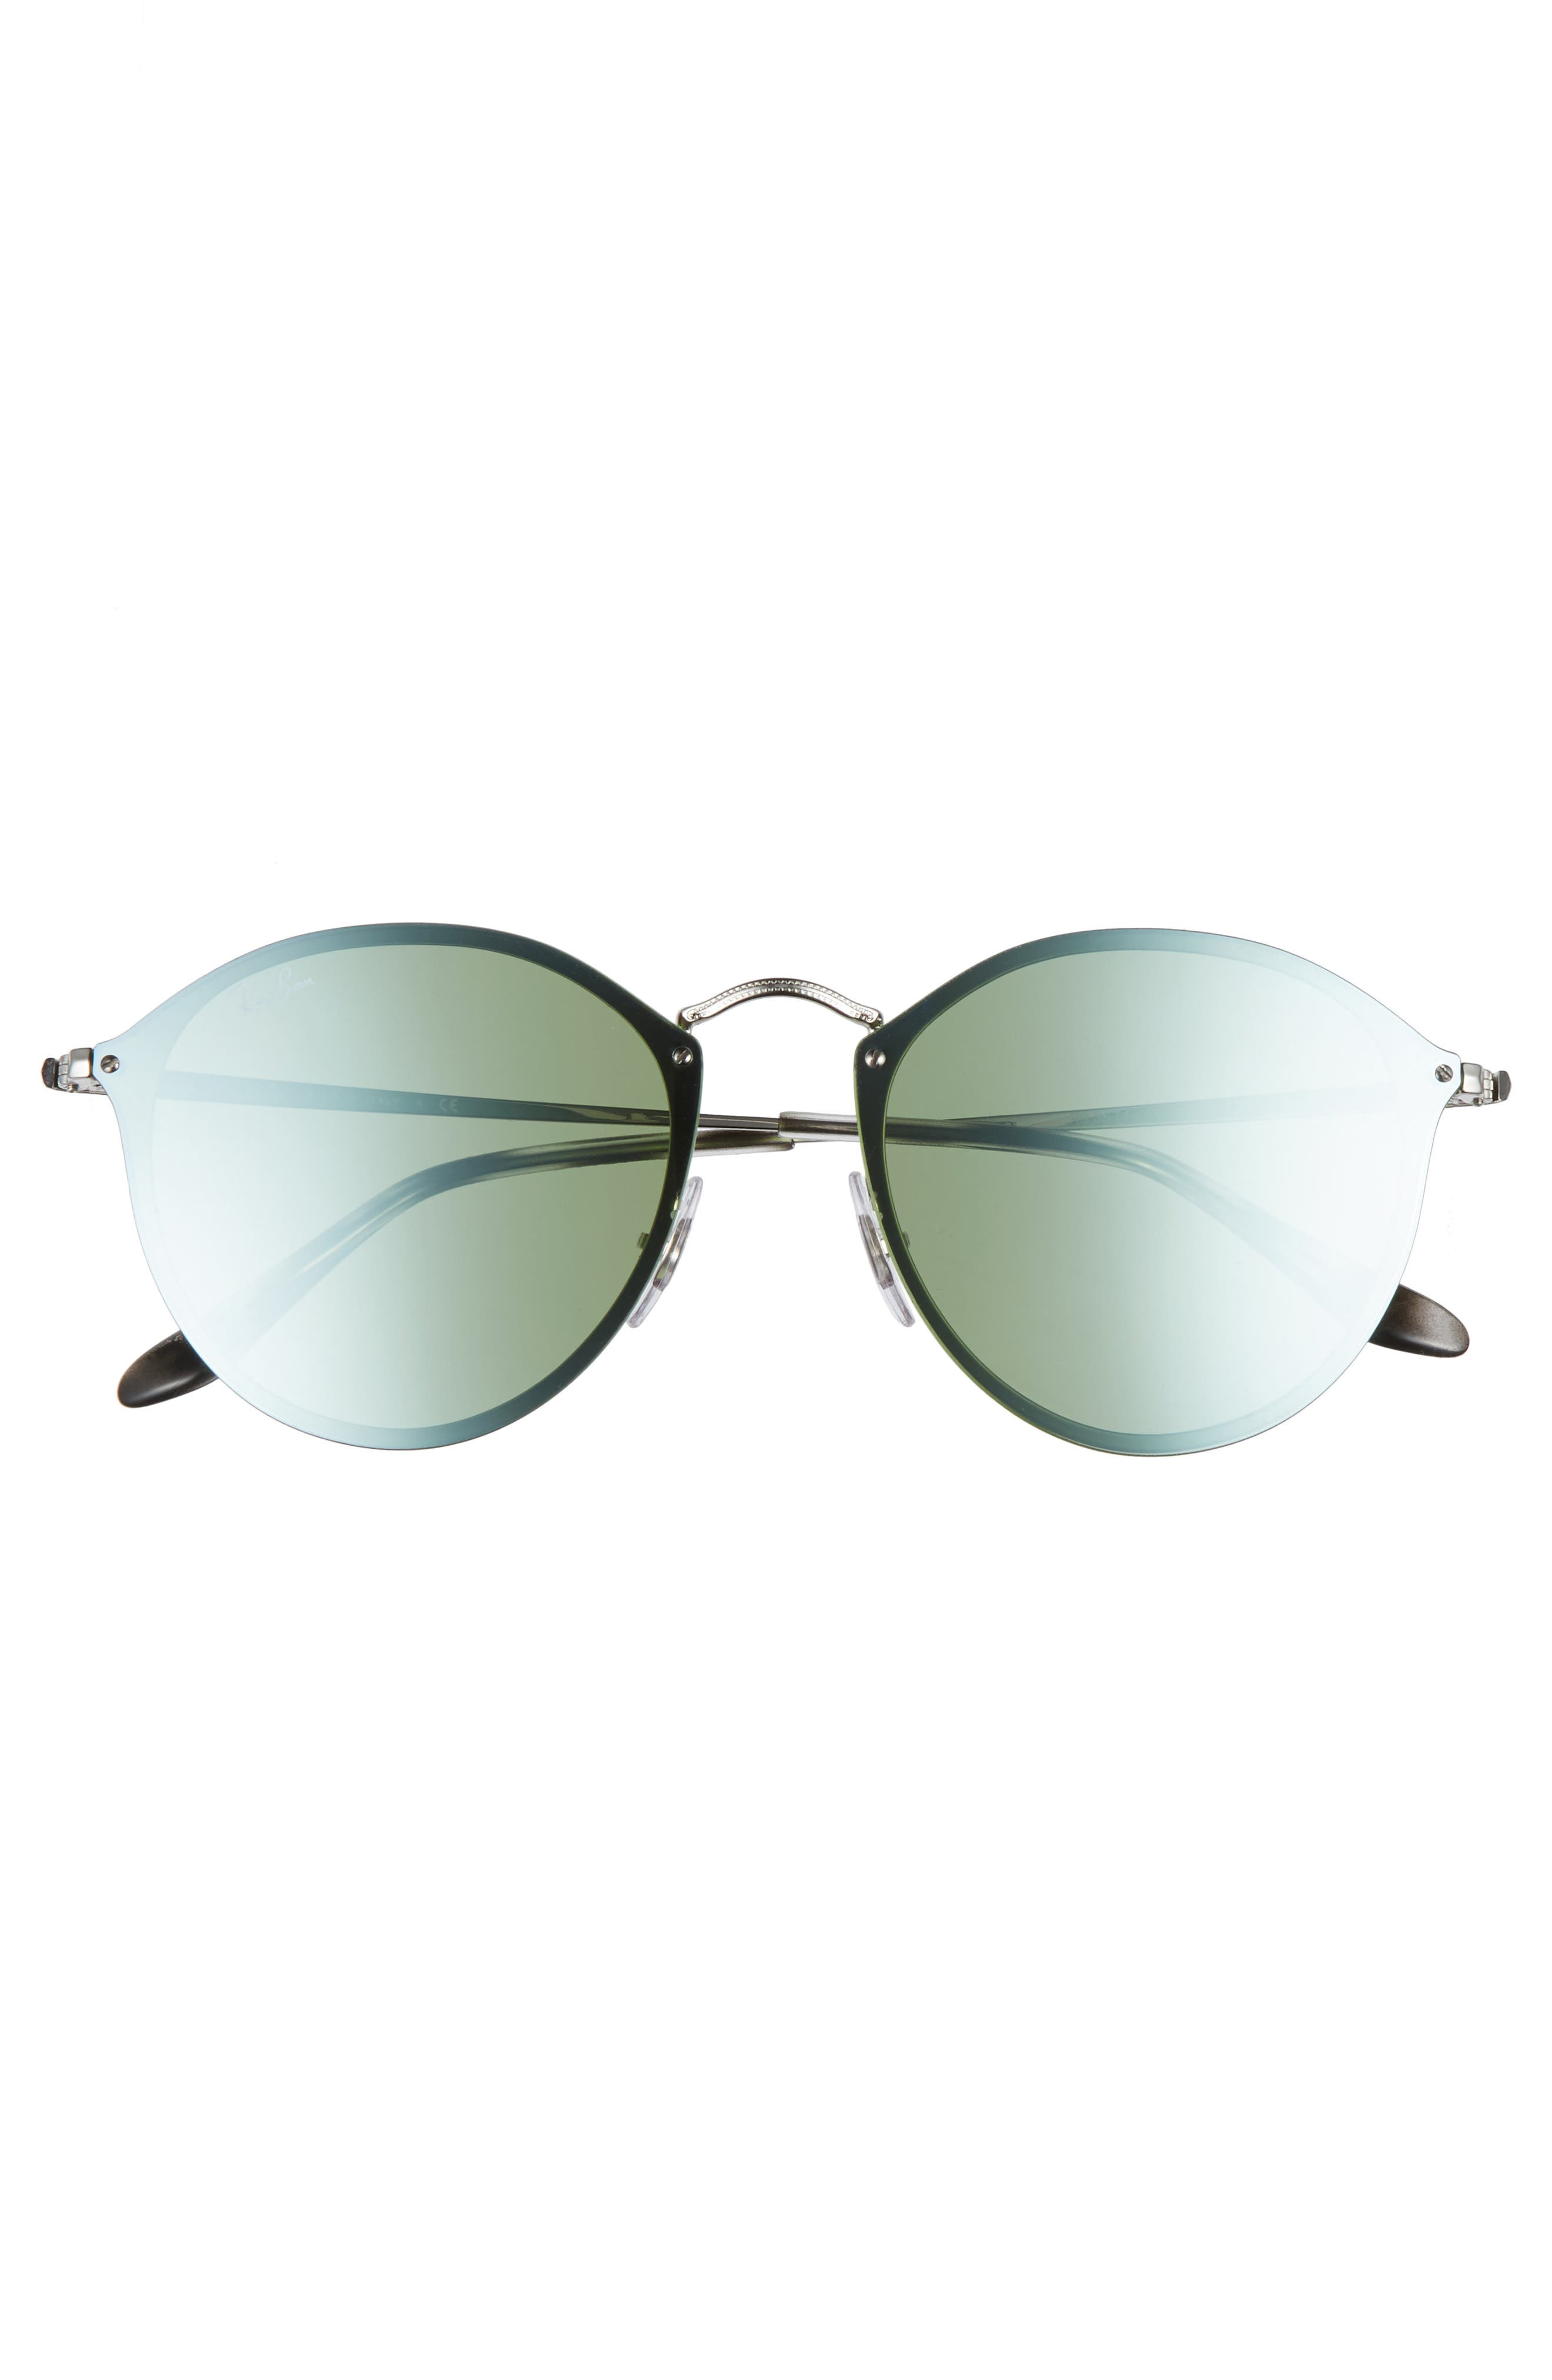 59mm Round Sunglasses,                             Alternate thumbnail 2, color,                             041